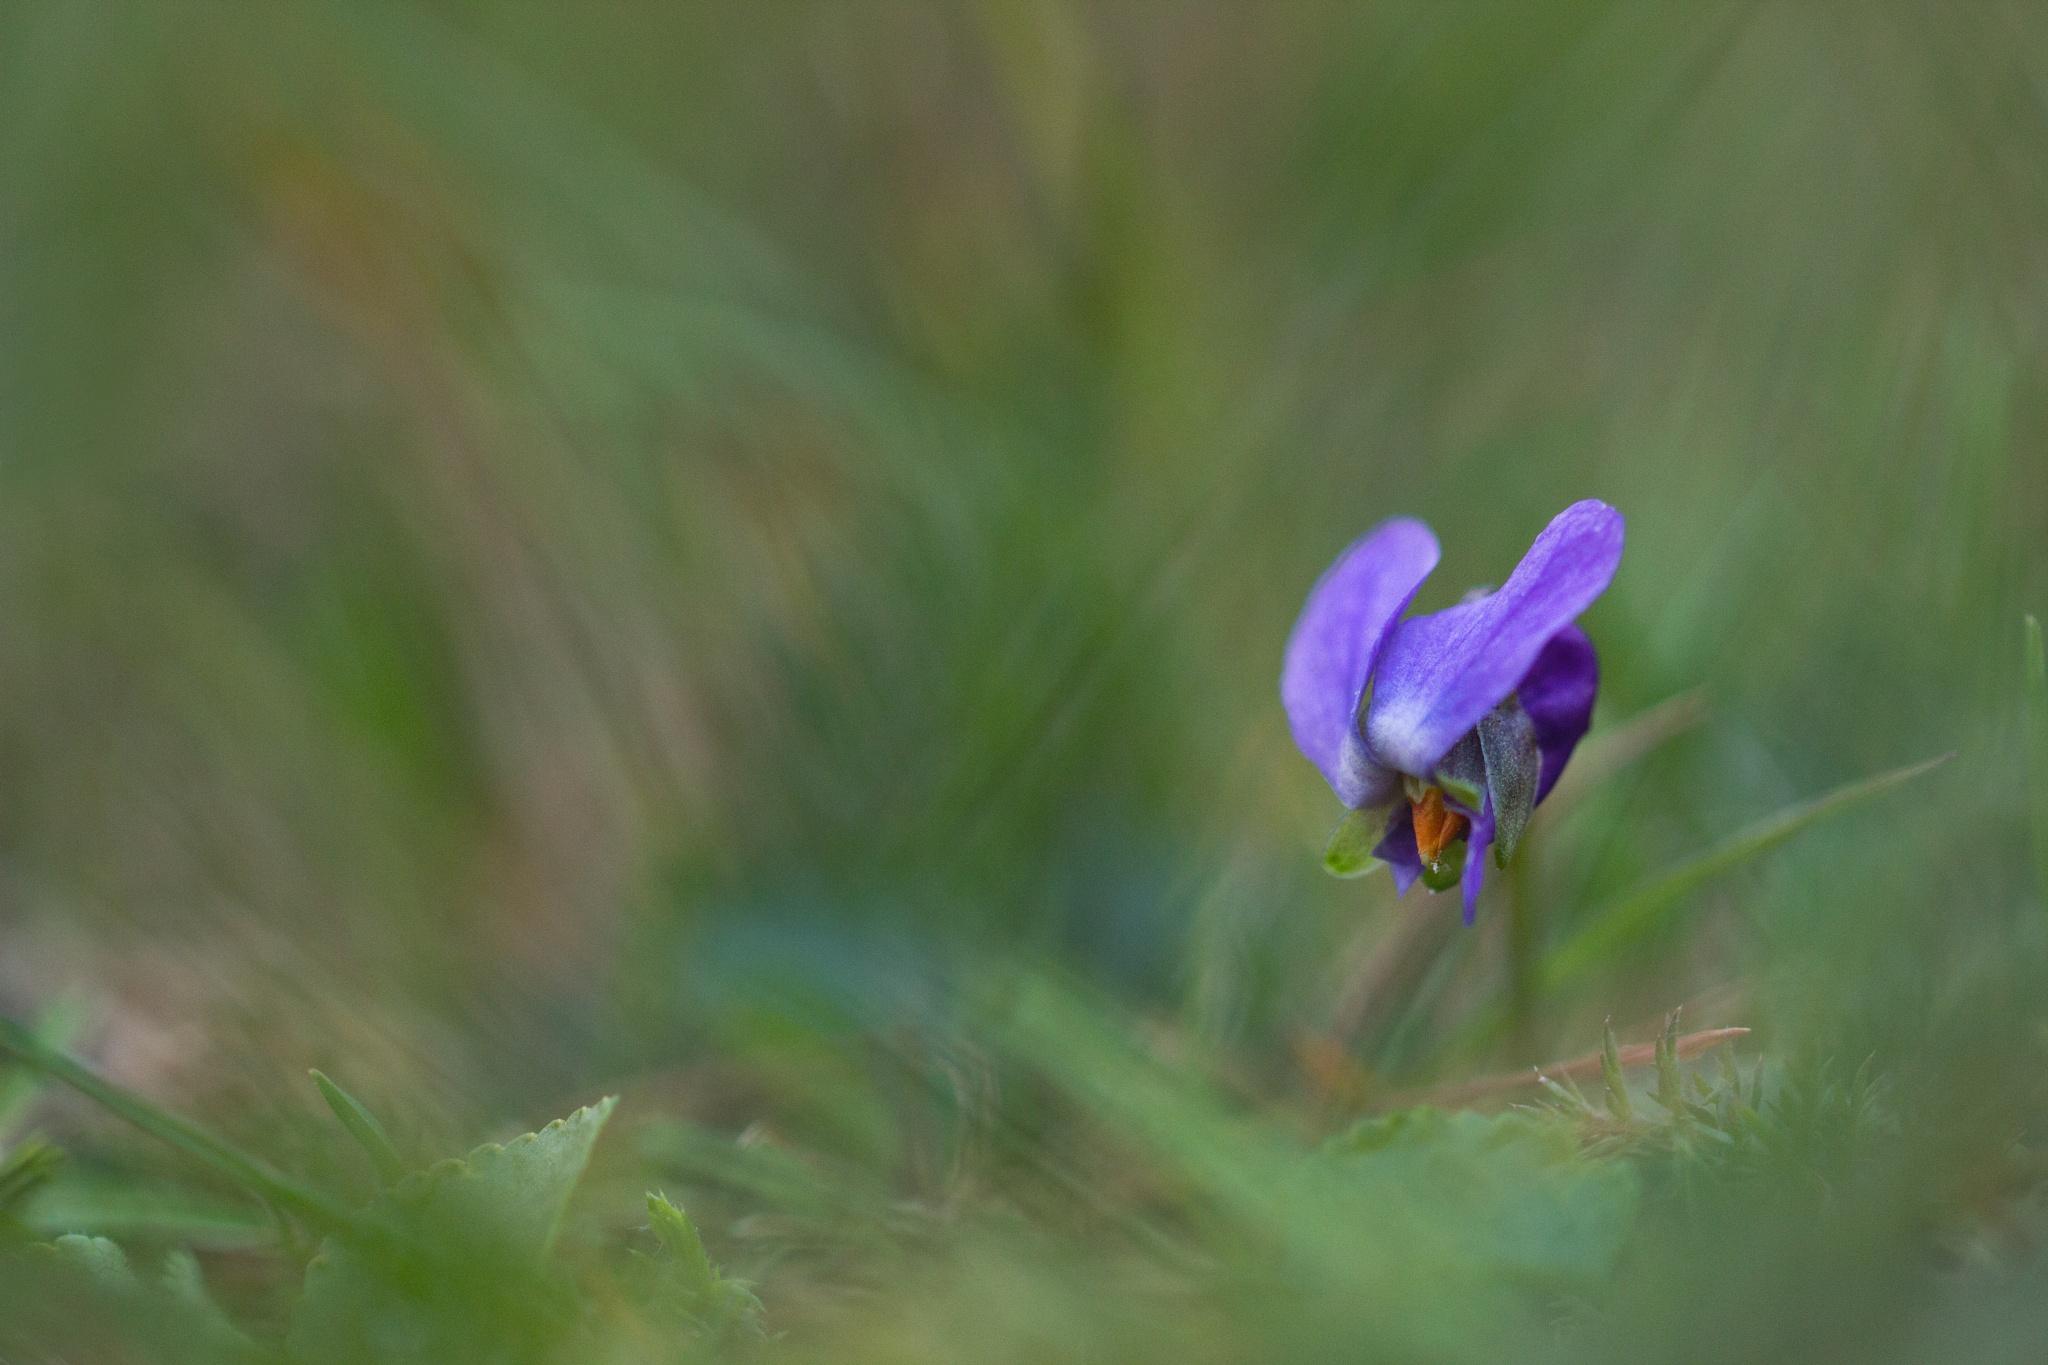 Fleur by Yves Droeven